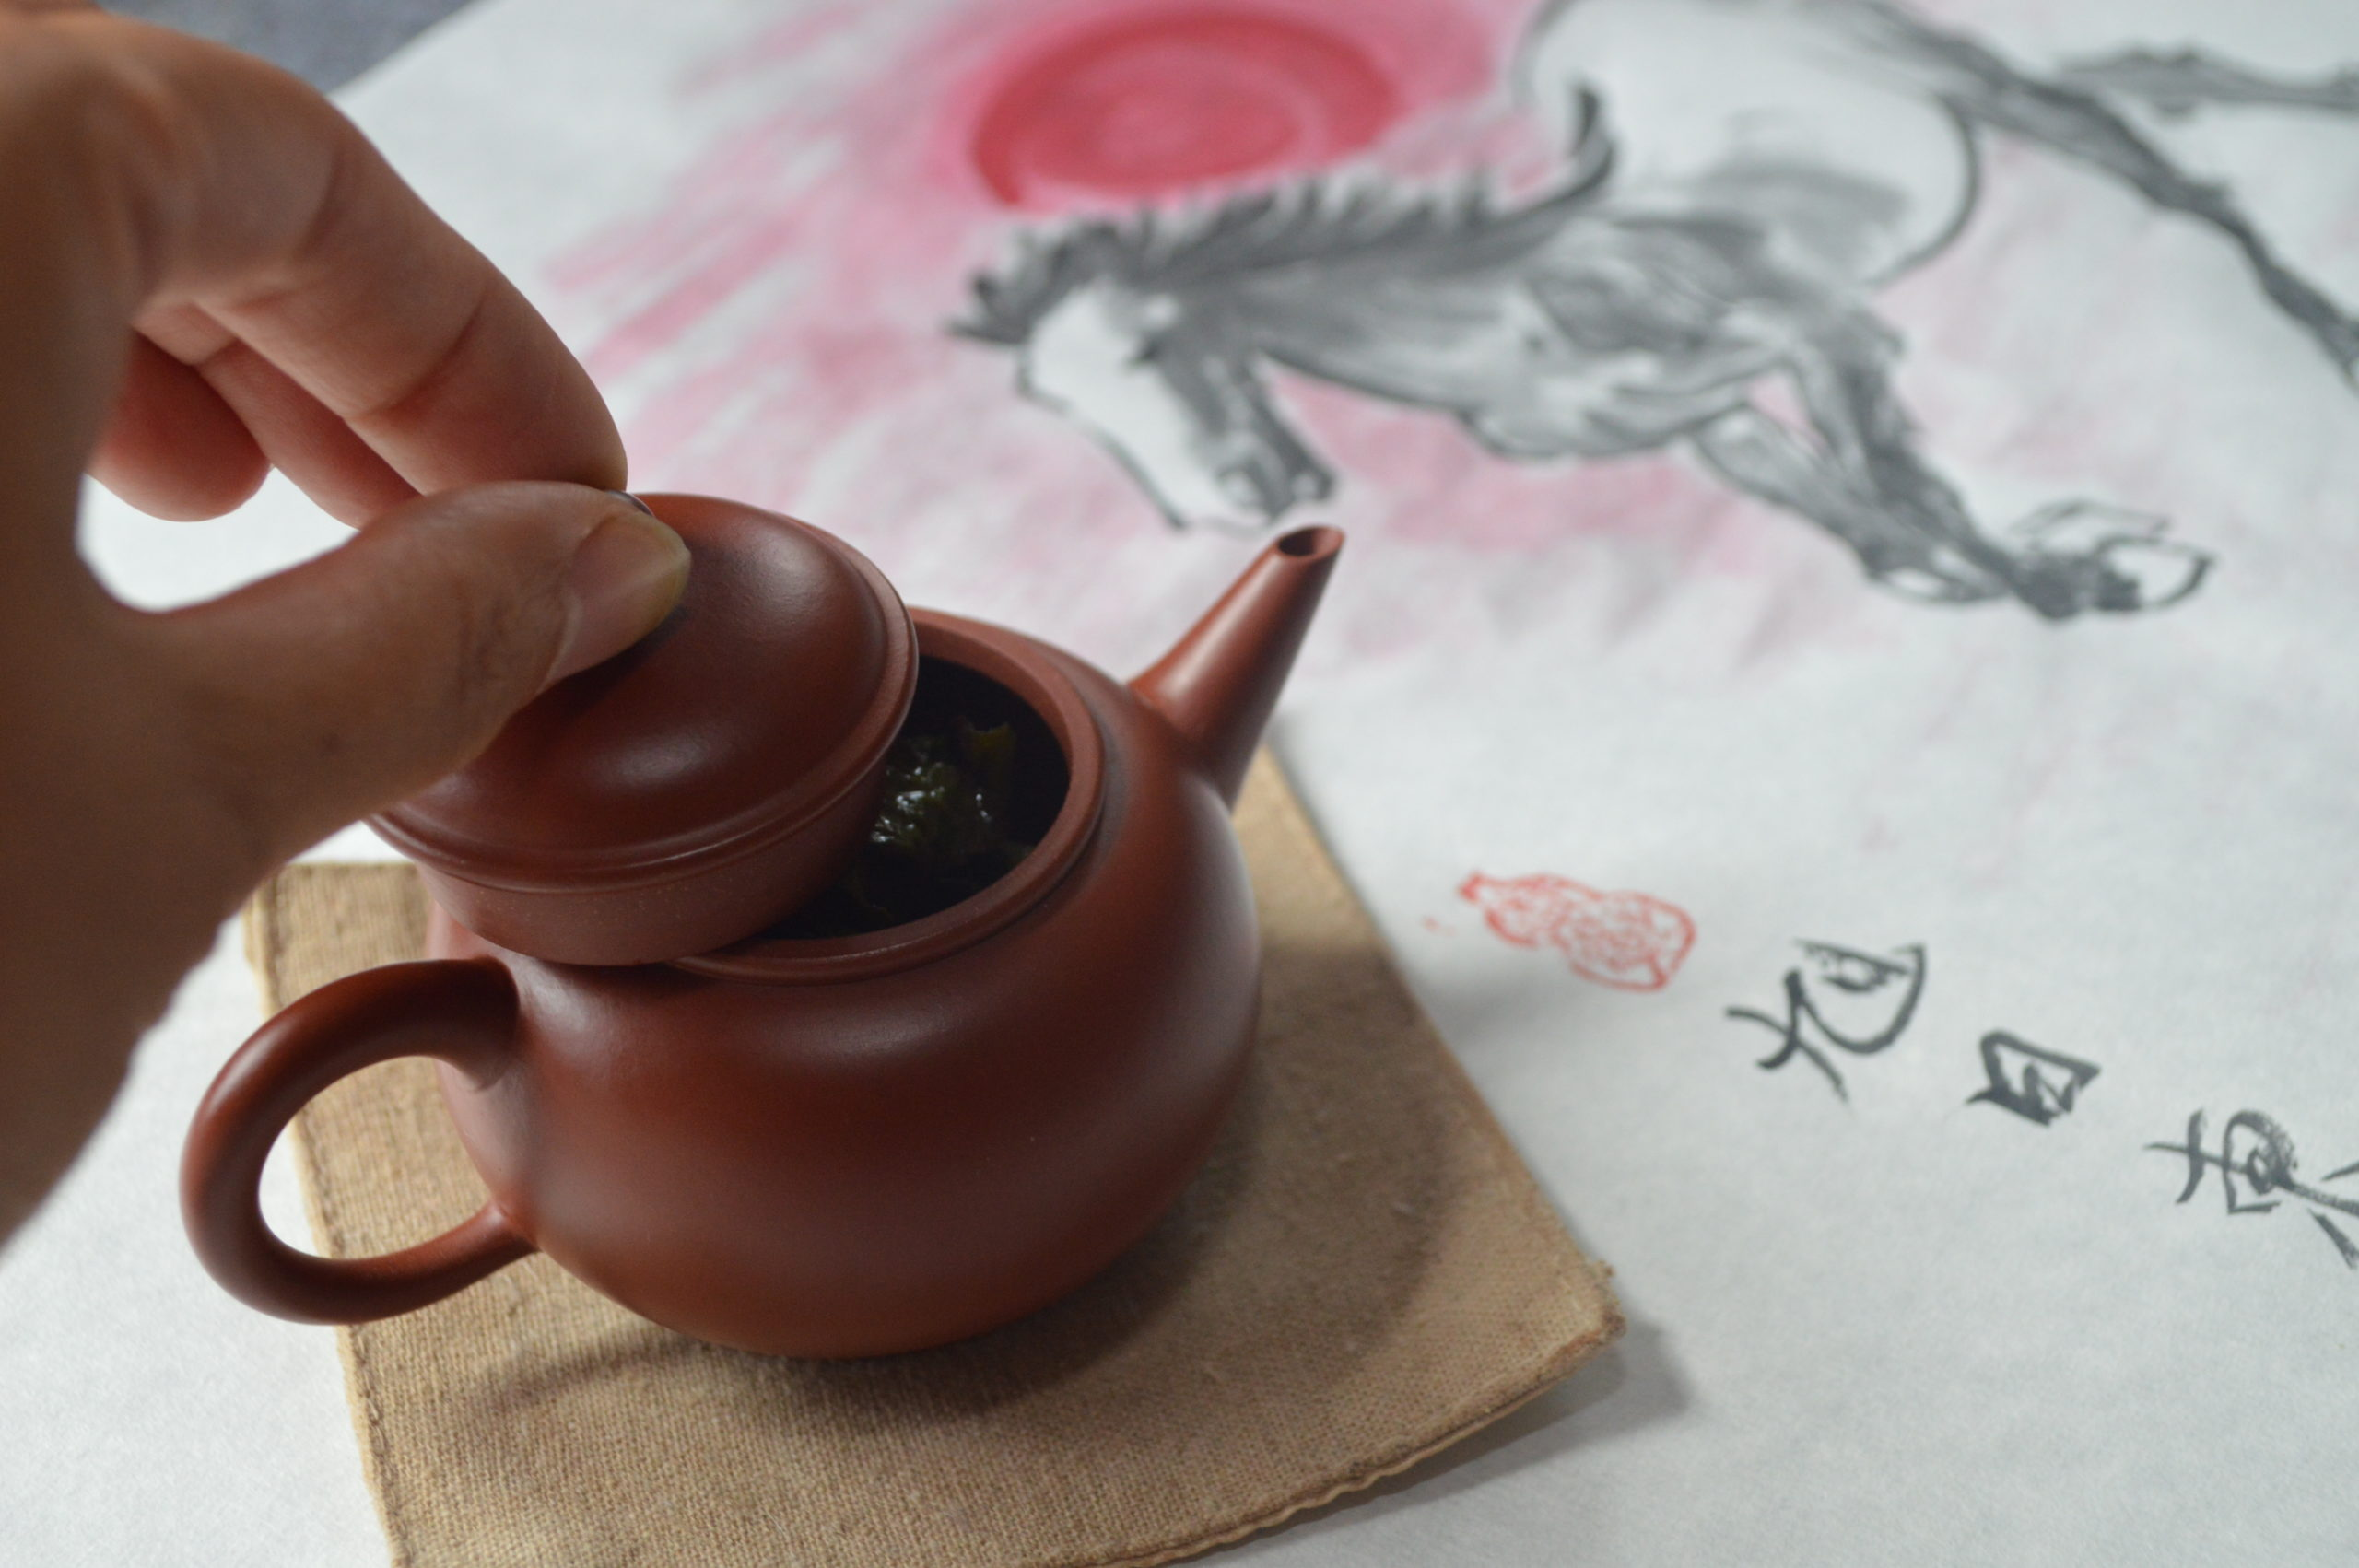 https://shop.liu-tea-art.com/wp-content/uploads/2019/07/DSC_0120-scaled.jpg